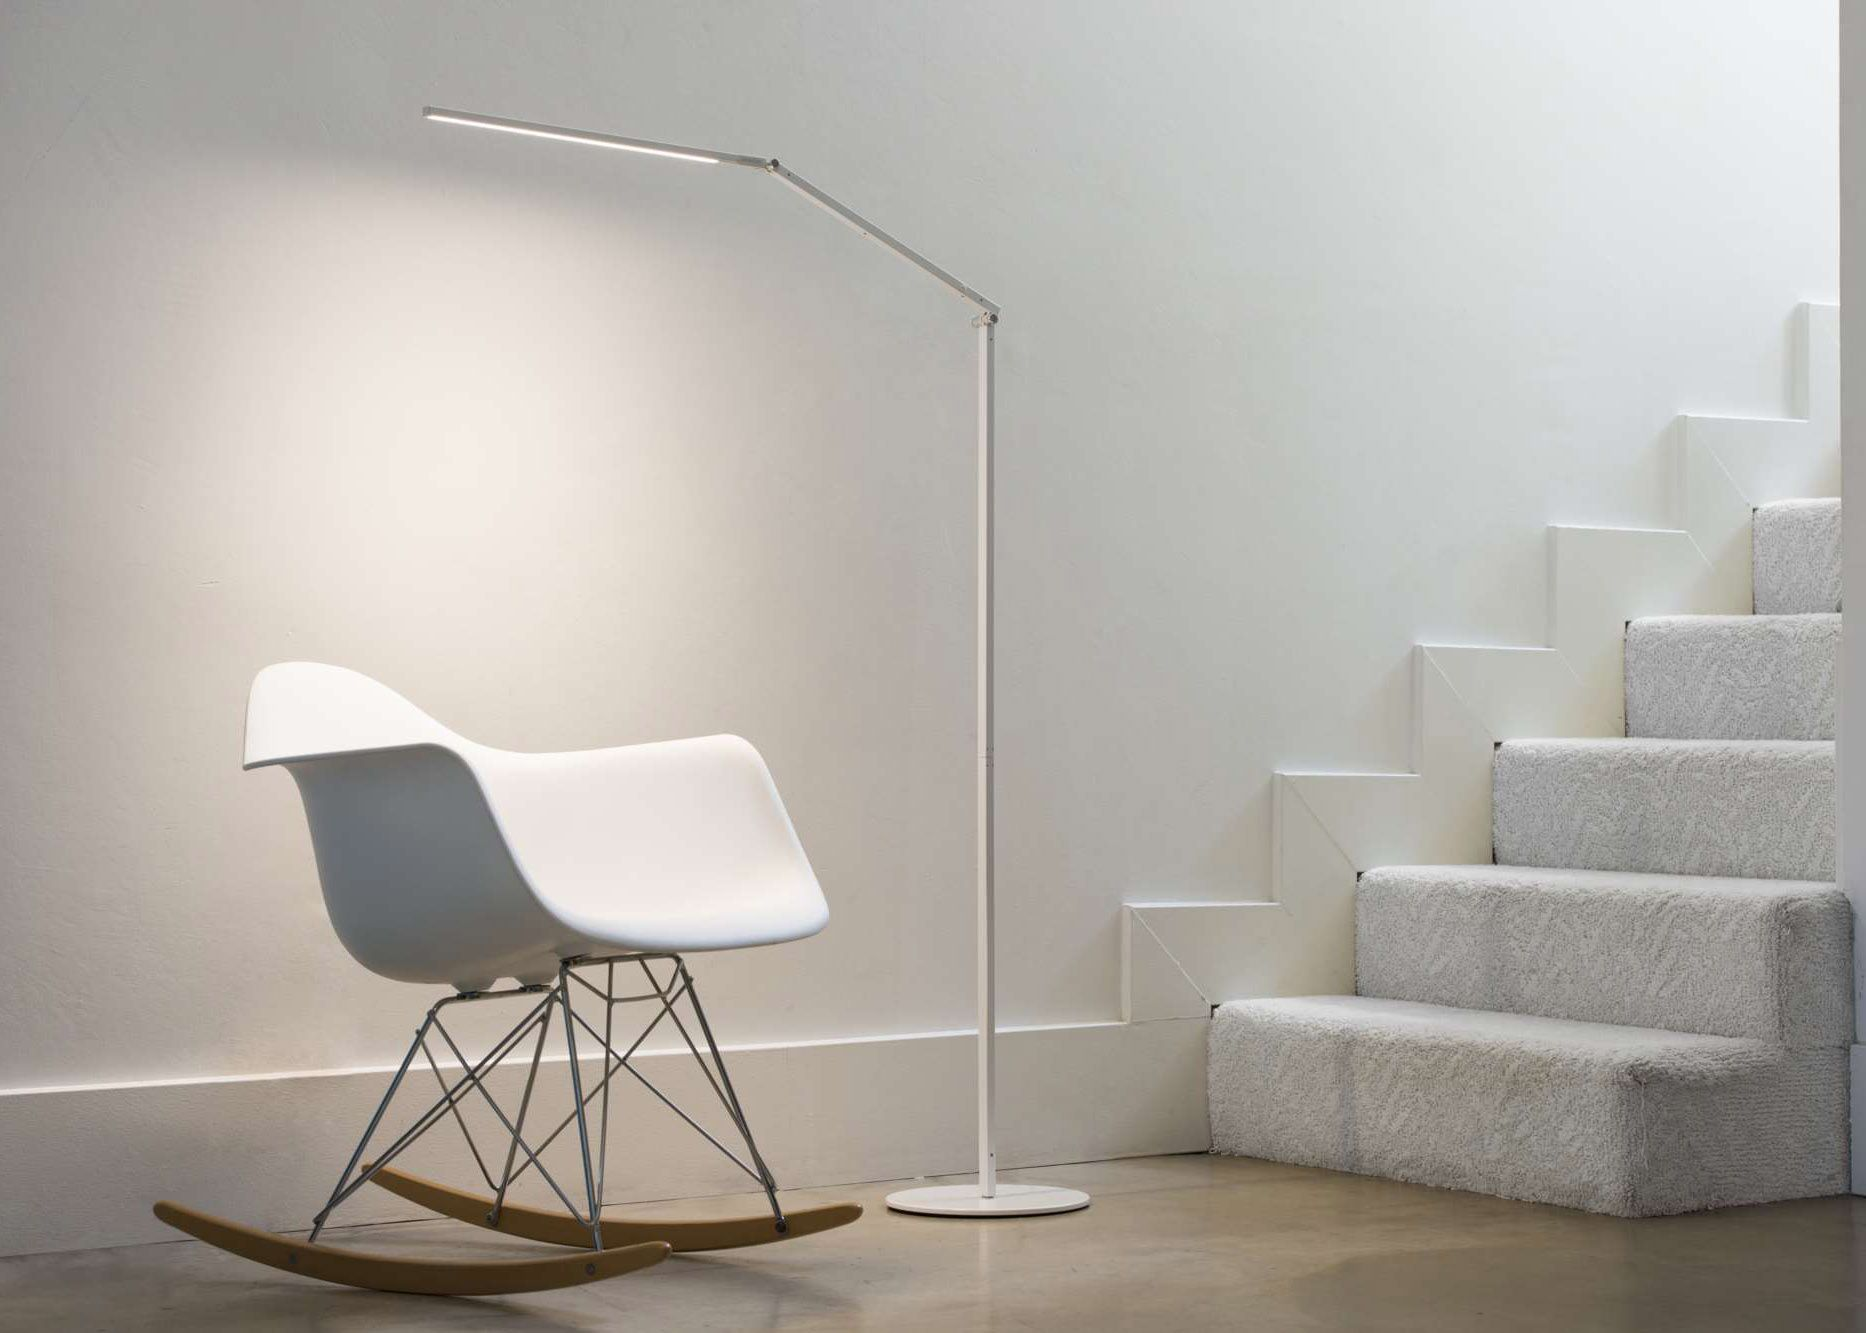 Z Bar From Koncept In 2020 Bar Flooring Floor Lamp Floor Lamp Design